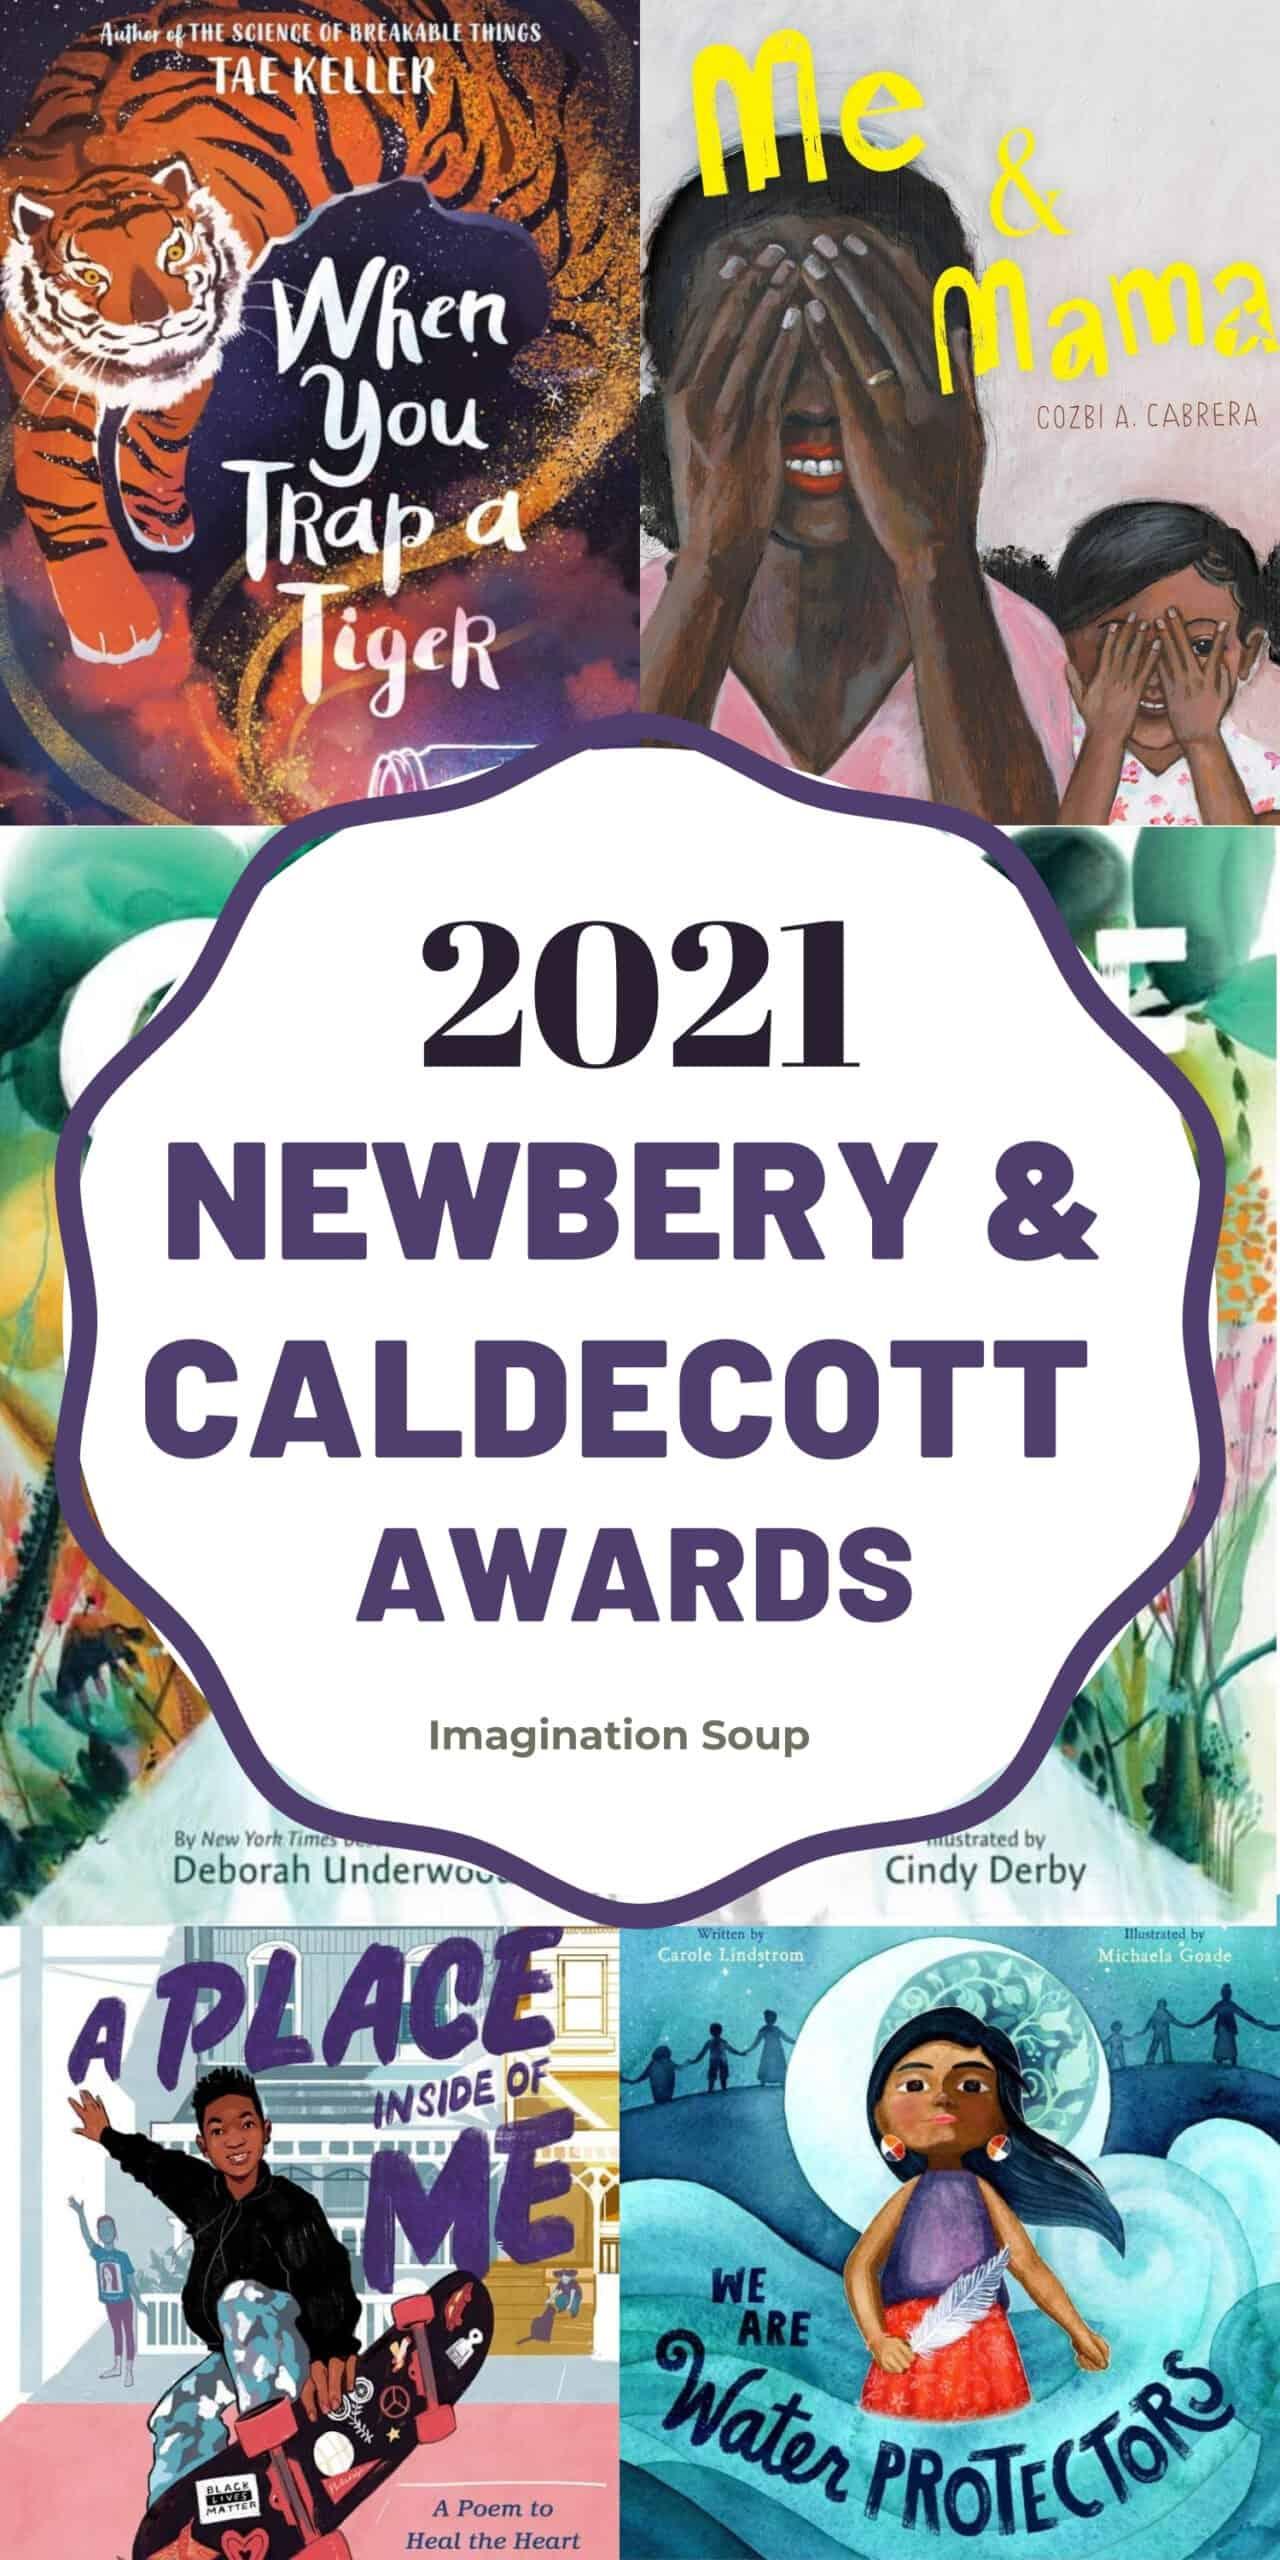 2021 Newbery & Caldecott Awards